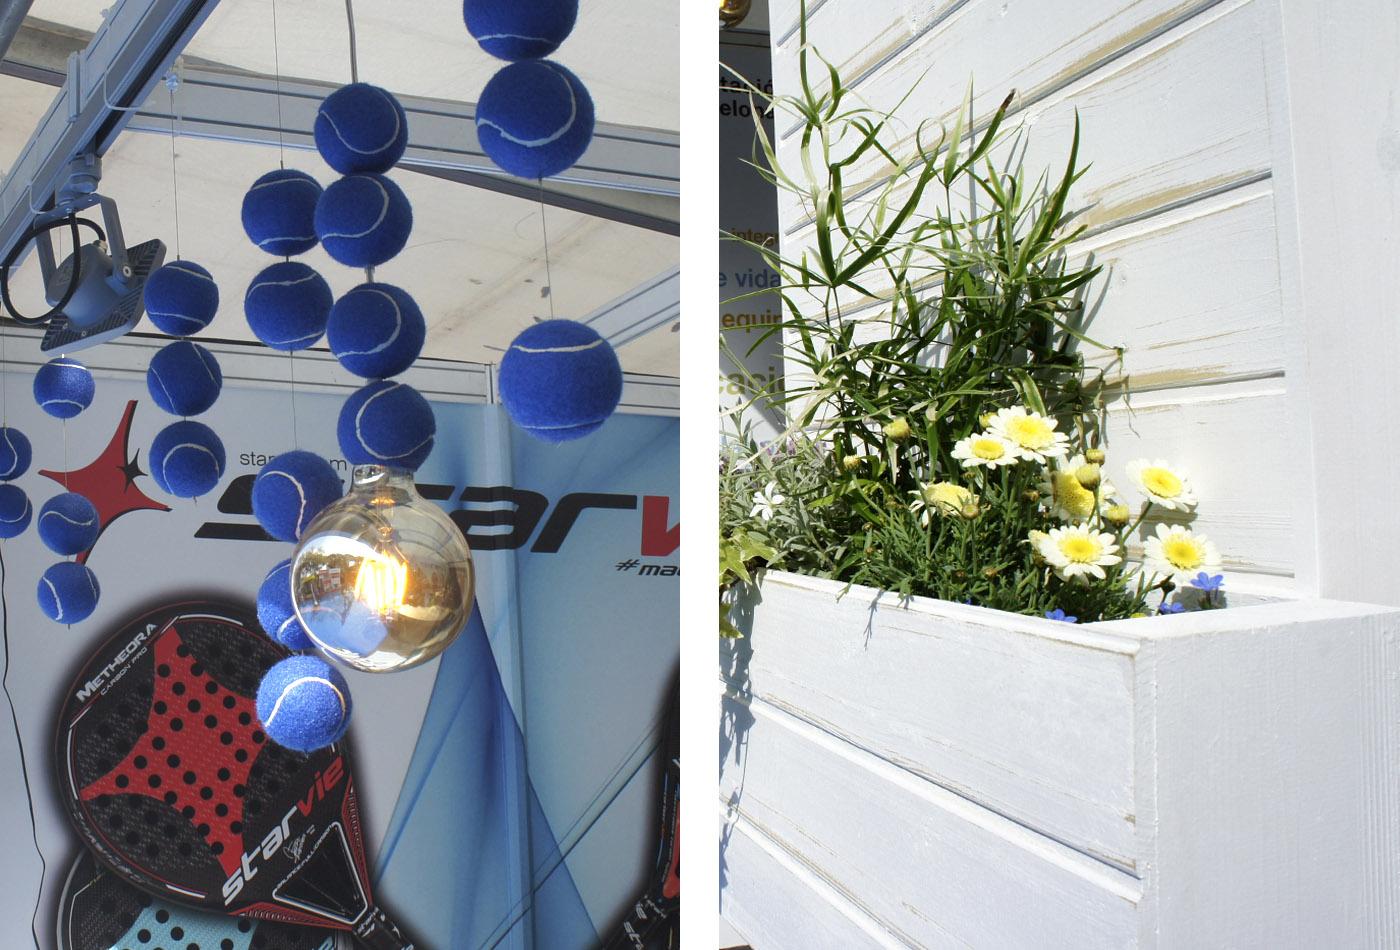 open-banc-sabadell-tenis-creartiva-rafa-nadal